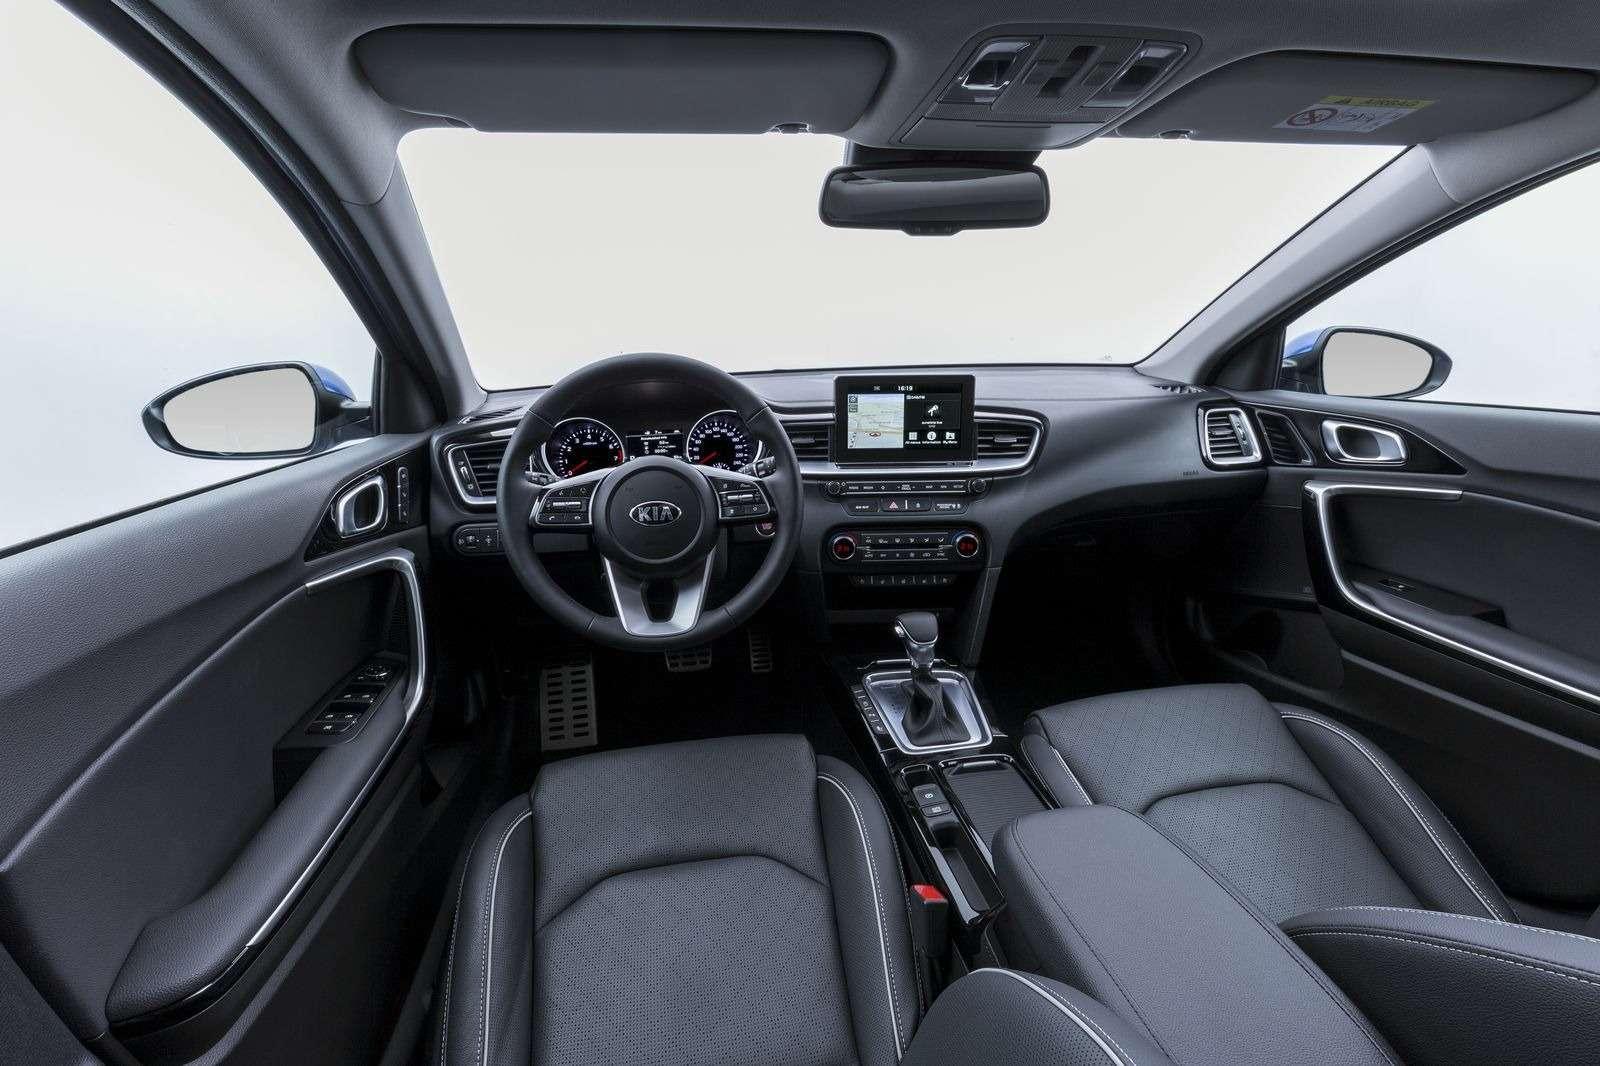 Новый Kia Ceed: началось производство вРоссии. Цен пока нет— фото 887513